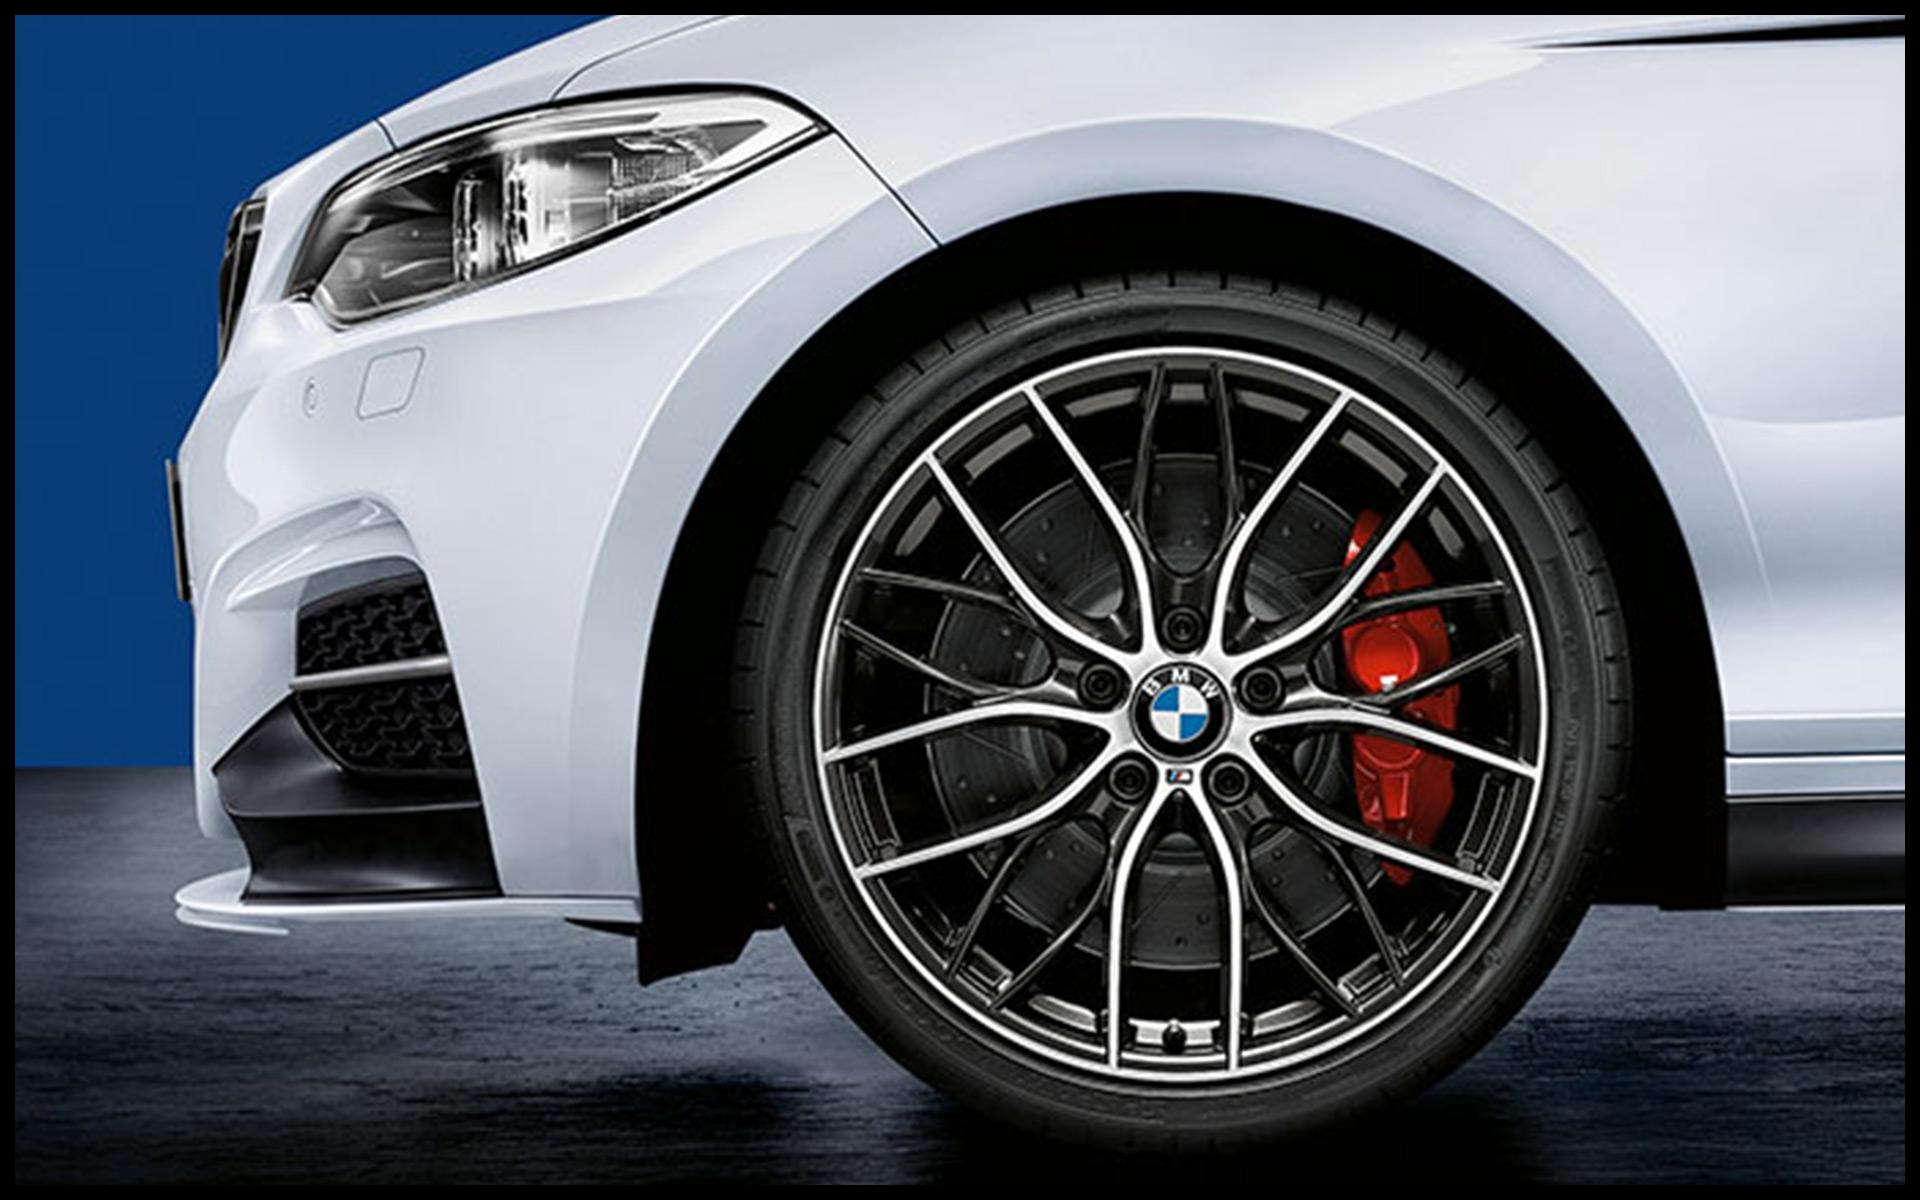 More motorsport for the BMW 5 series sedan